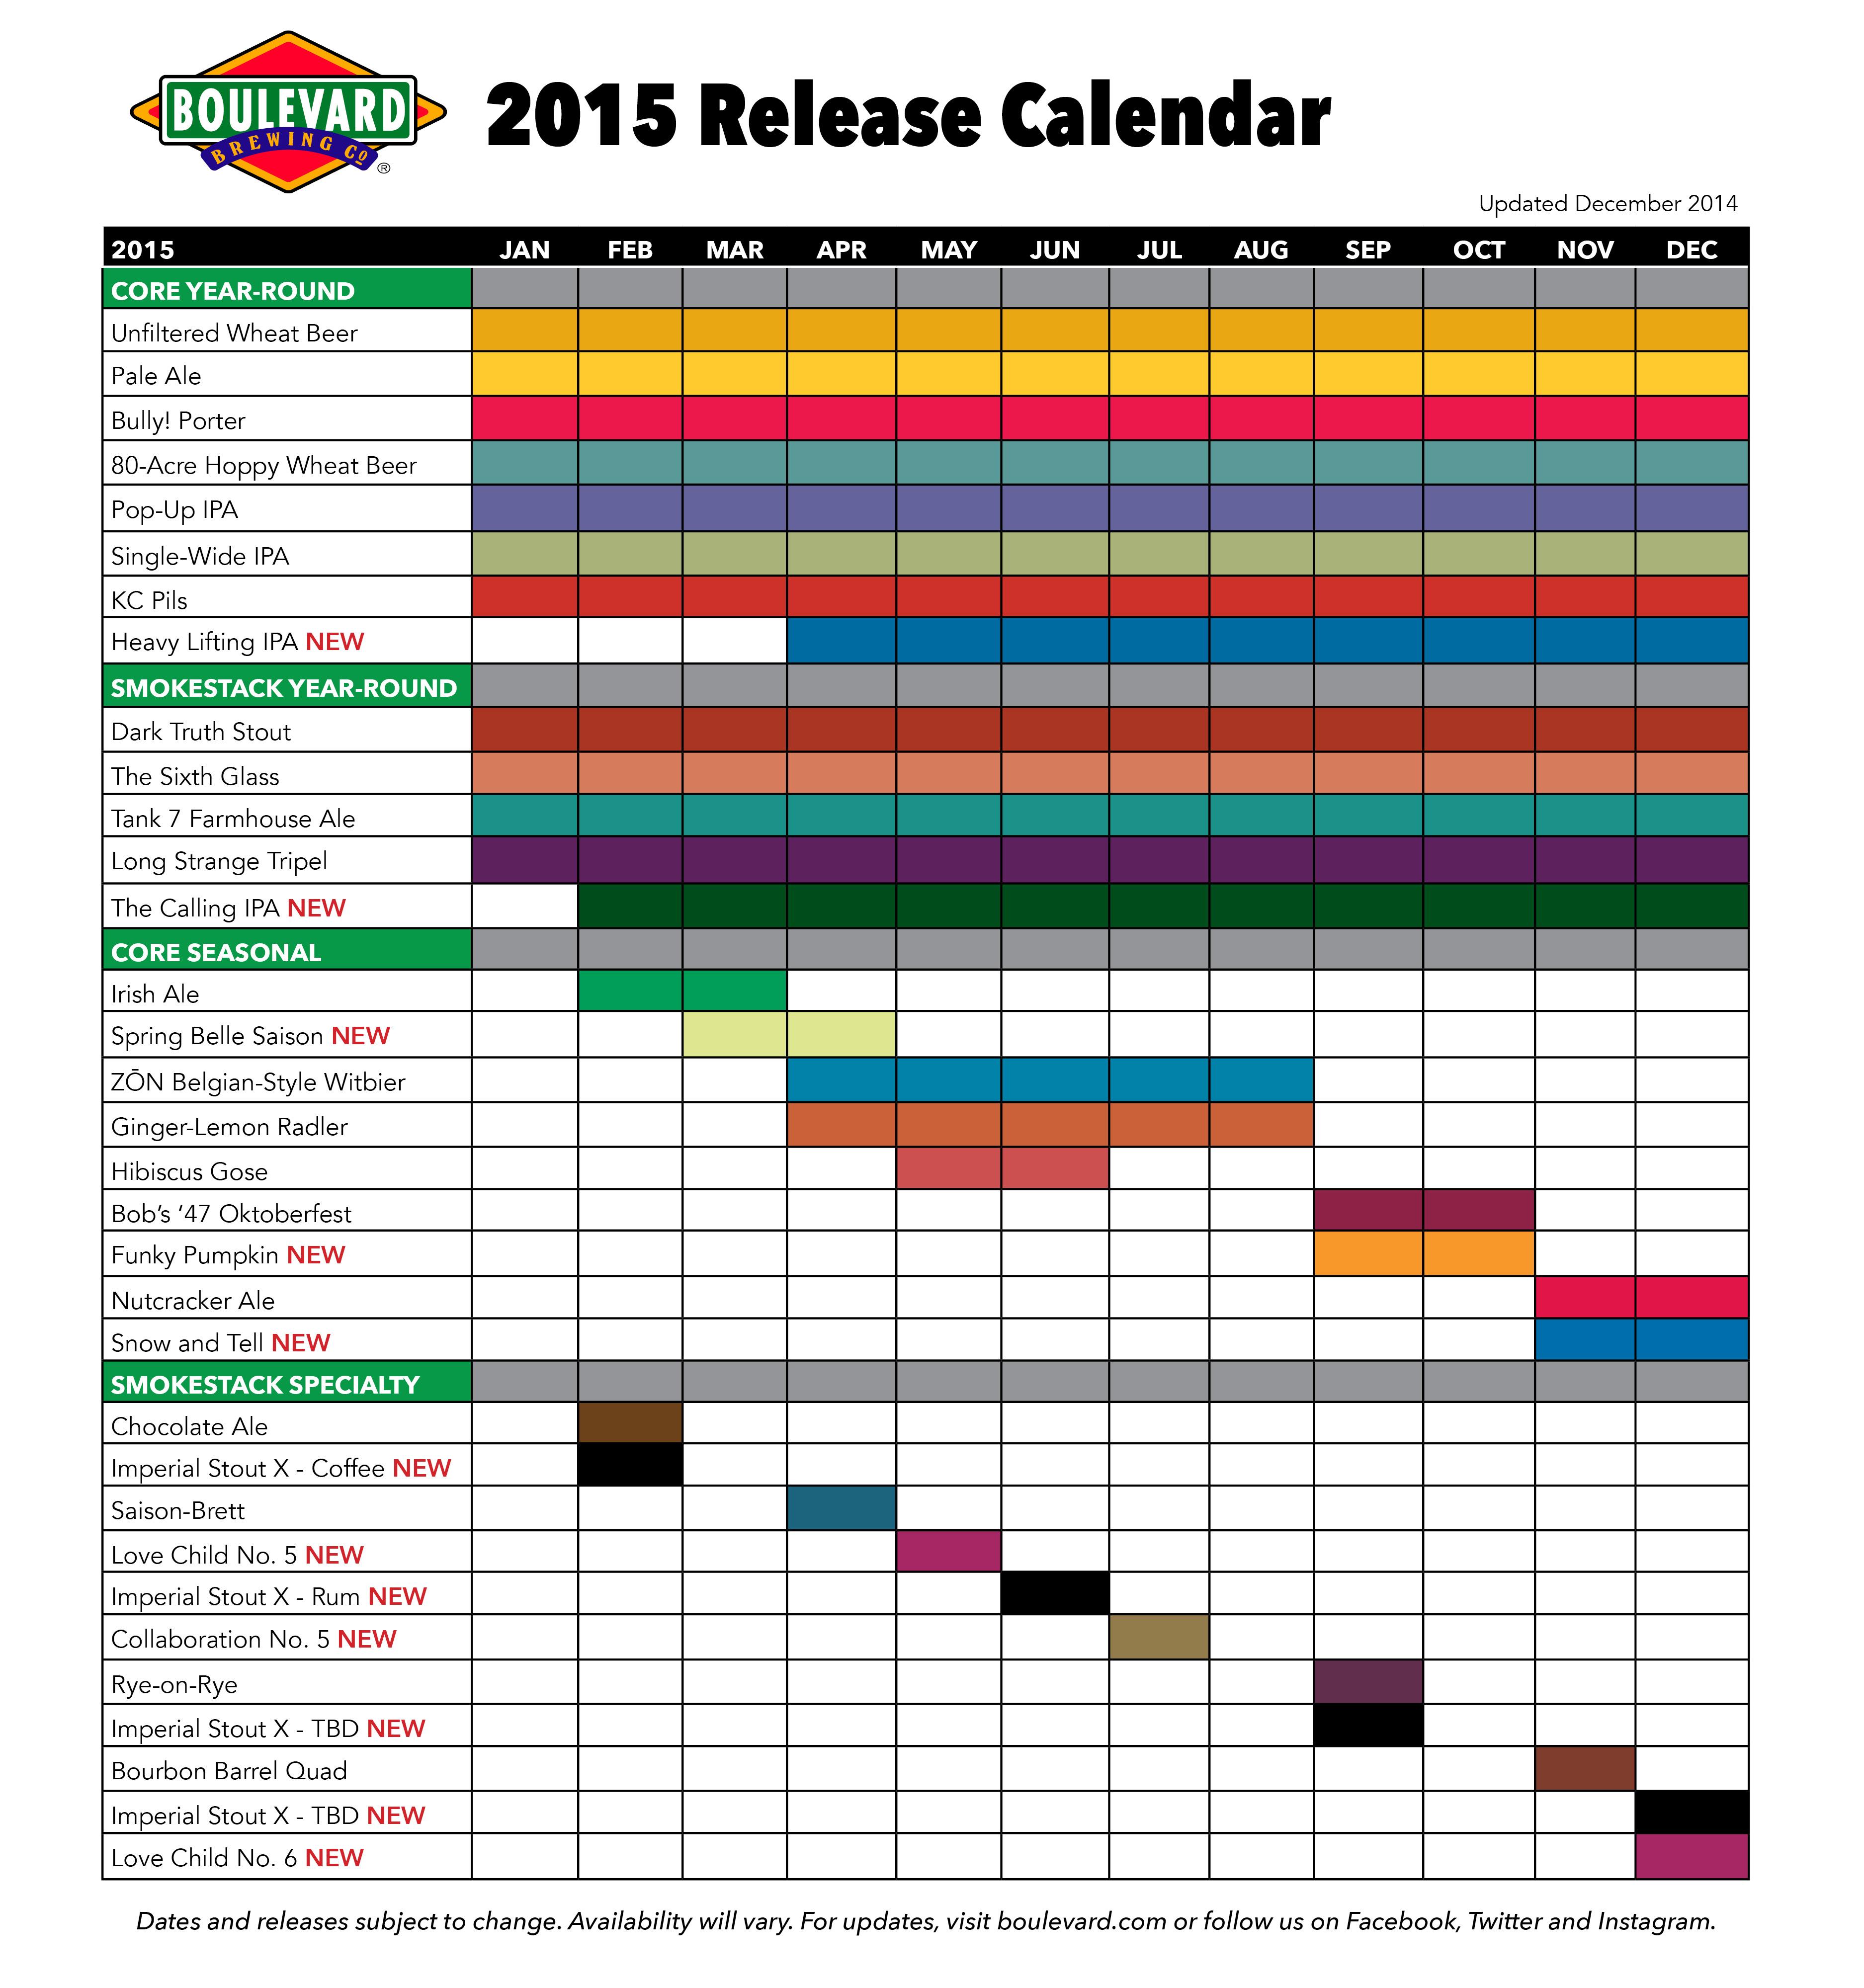 Calendar Craft 2015 : Craft beer release calendarsporchdrinking